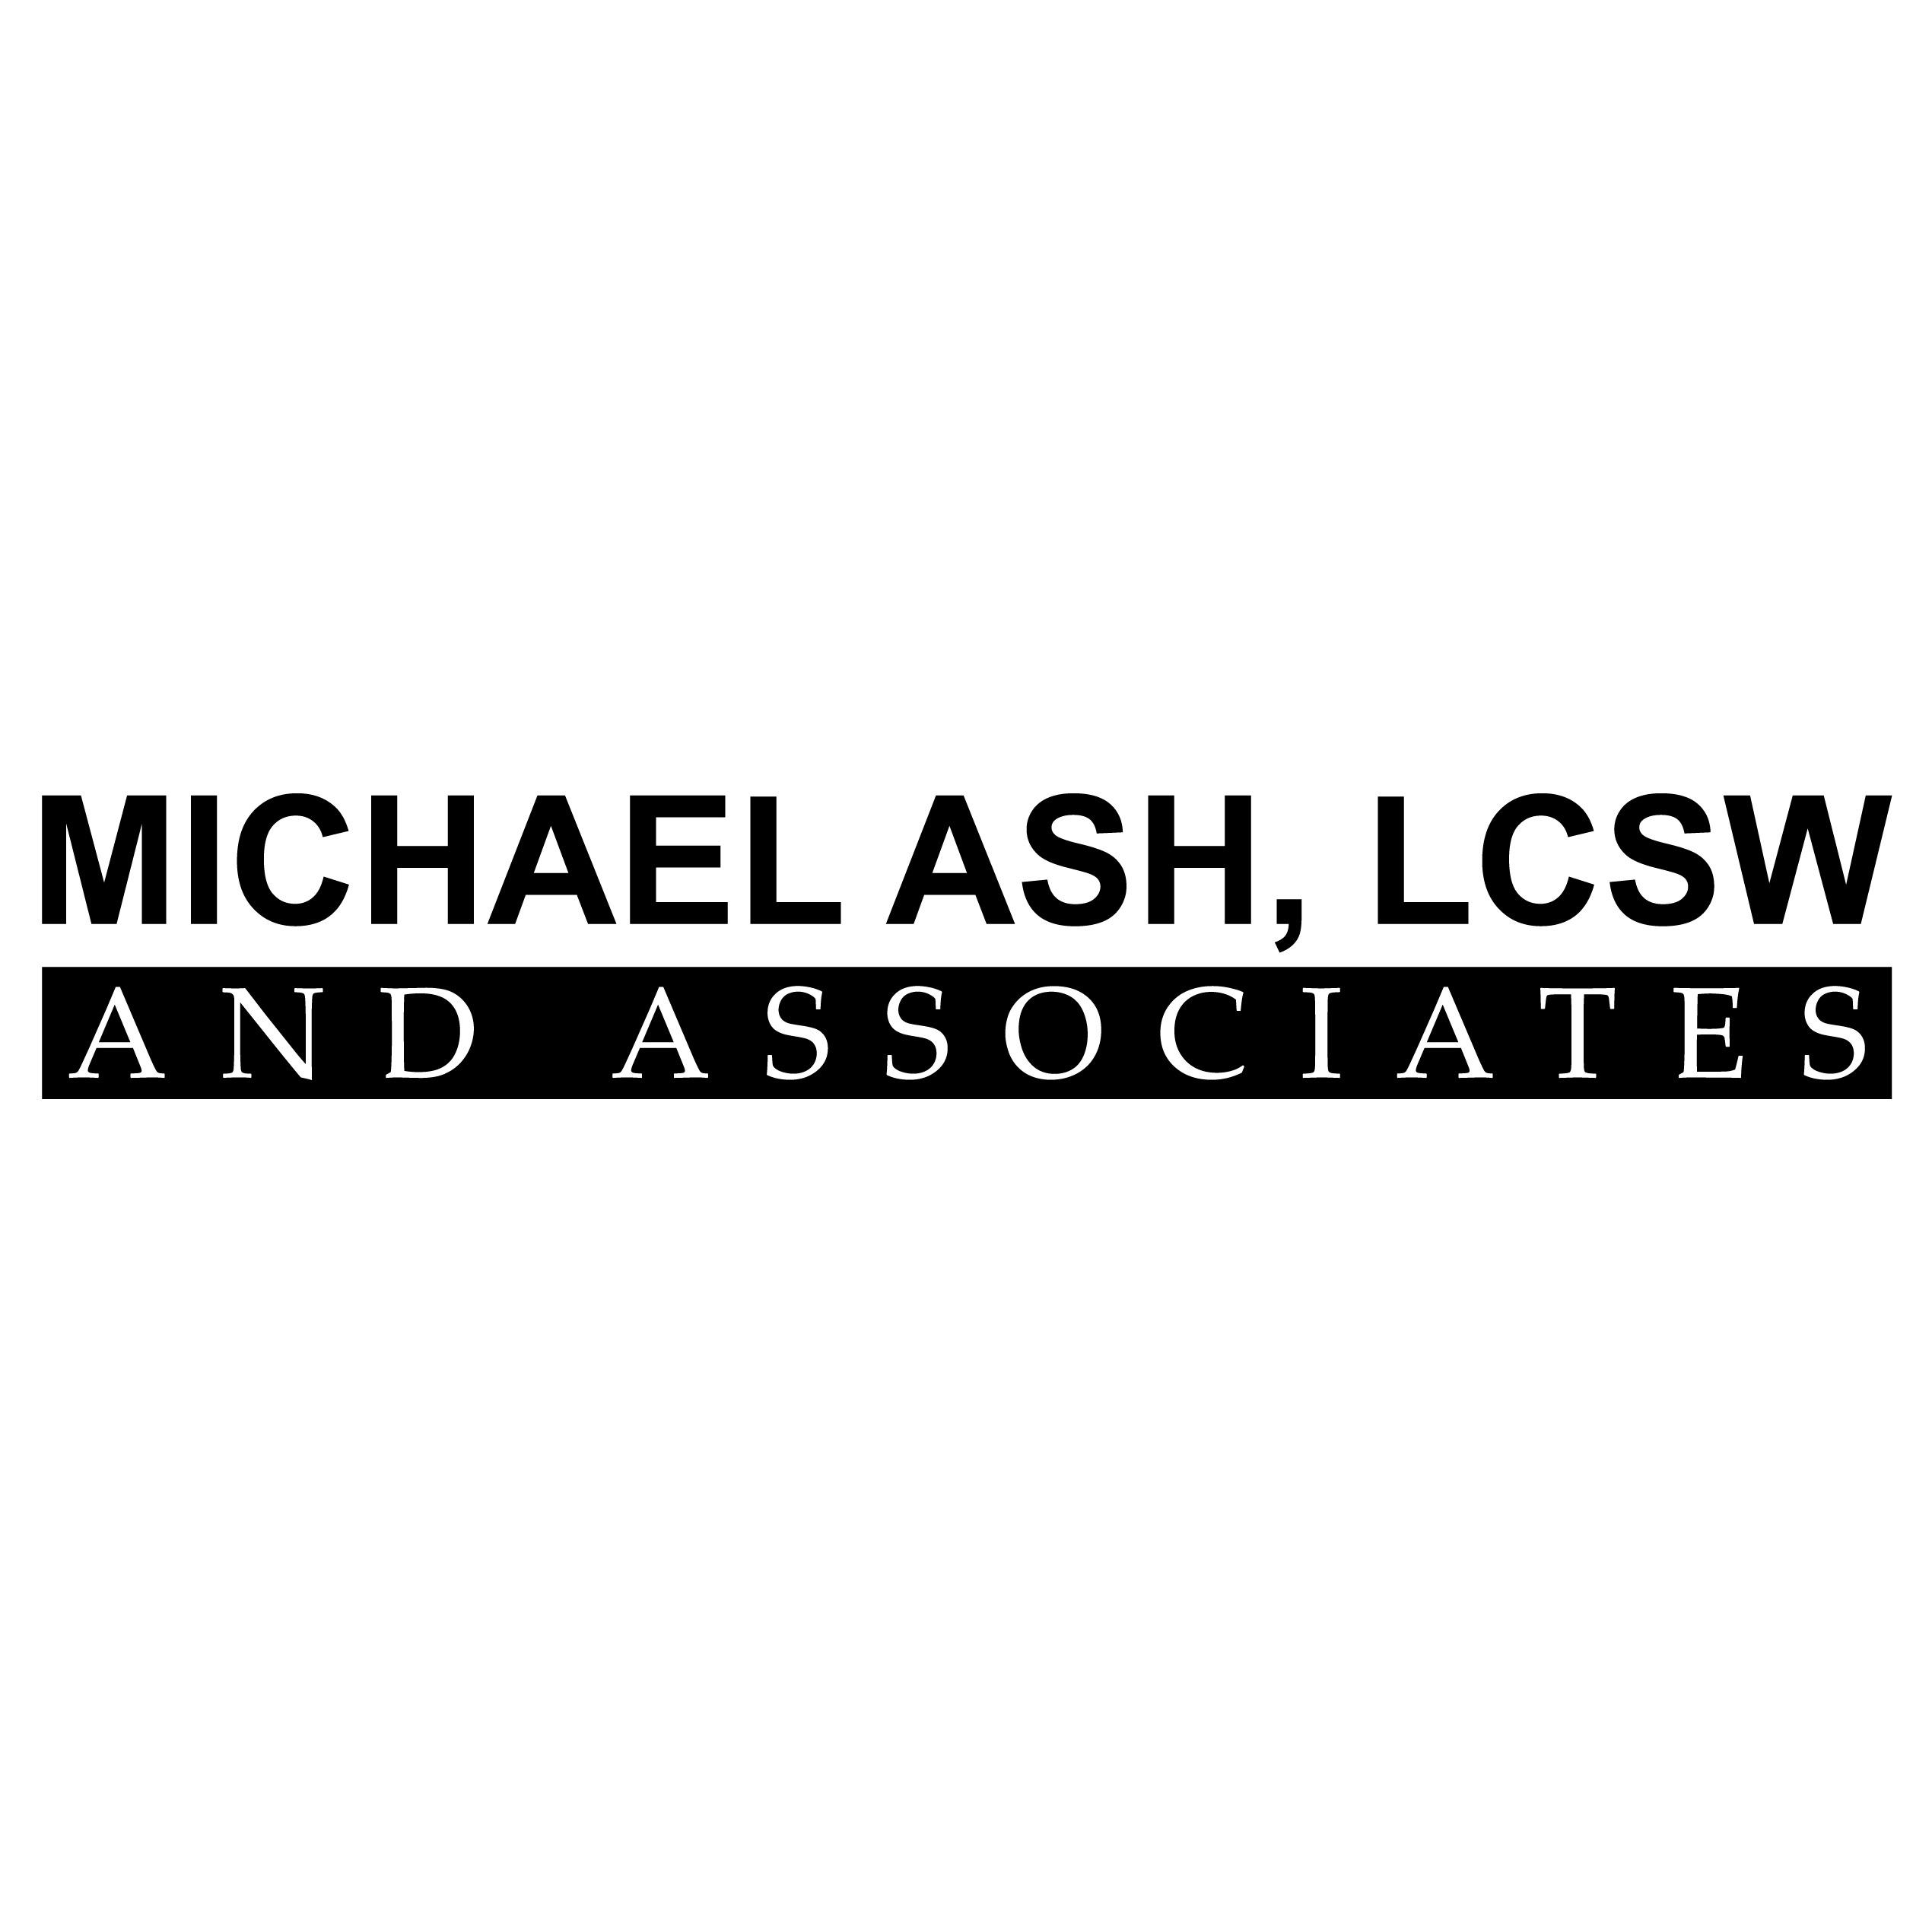 Michael Ash, LCSW & Associates